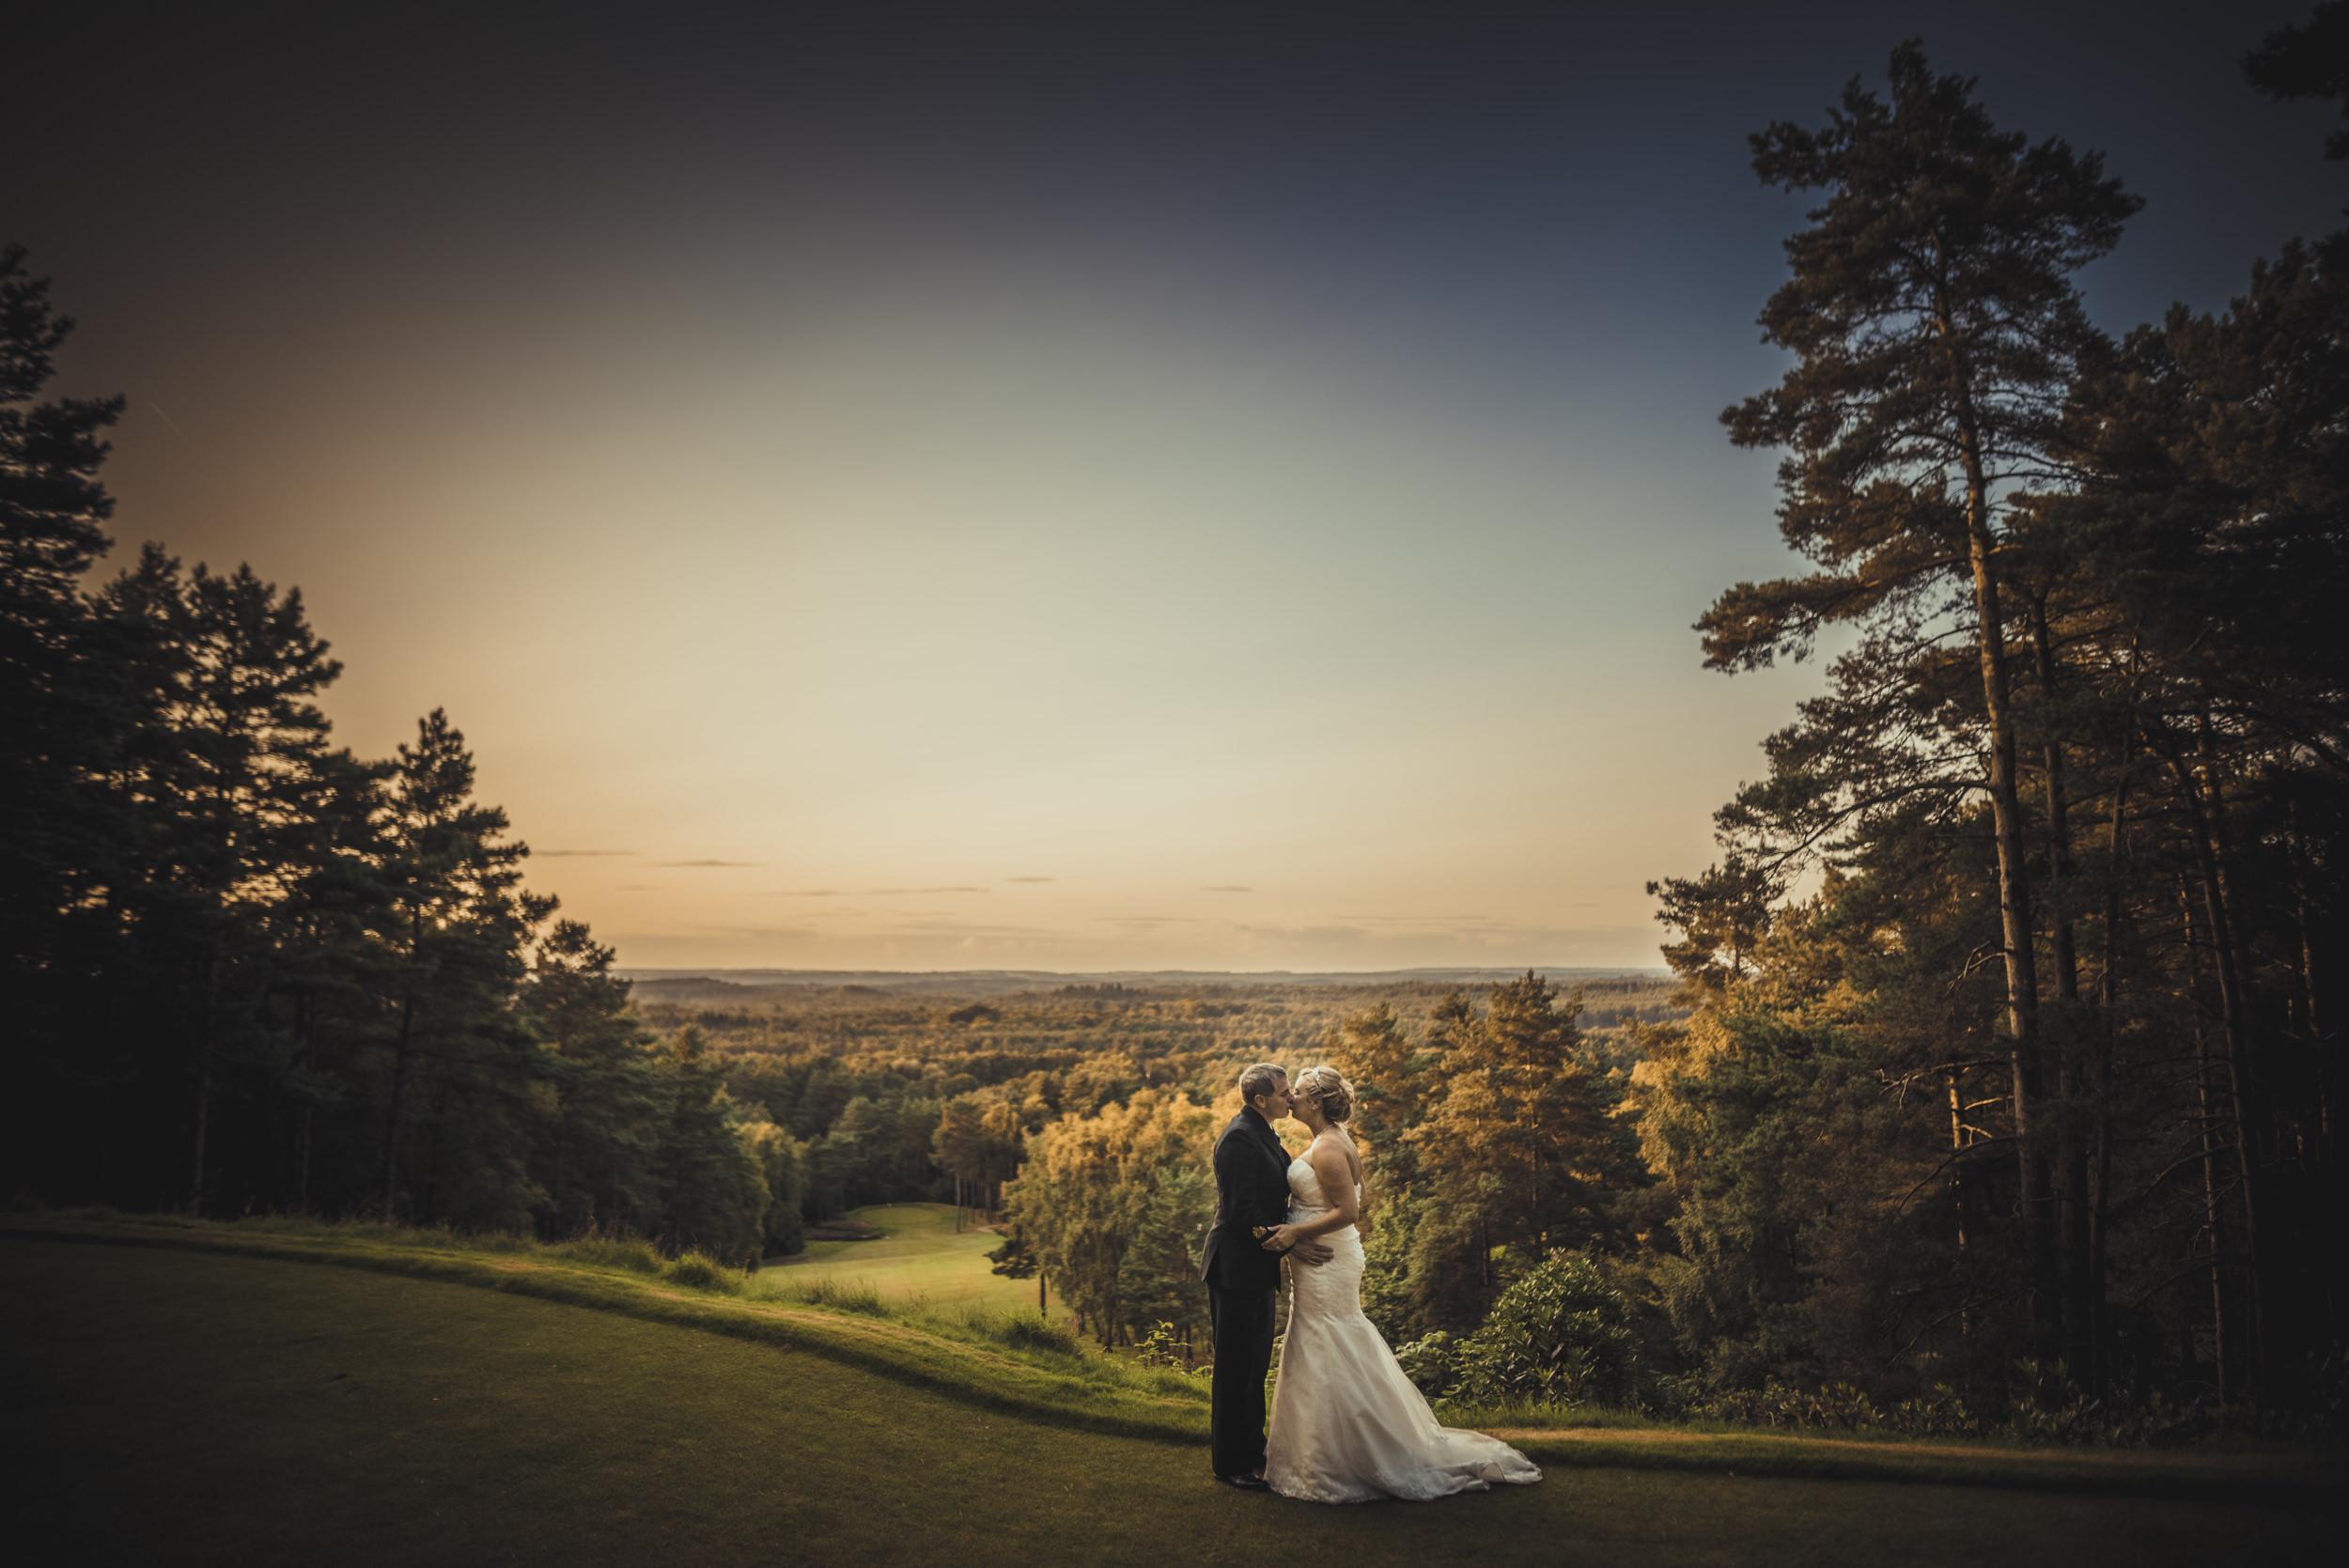 Chantelle-and-Stephen-Old-Thorns-Hotel-Wedding-Liphook-Manu-Mendoza-Wedding-Photography-488.jpg